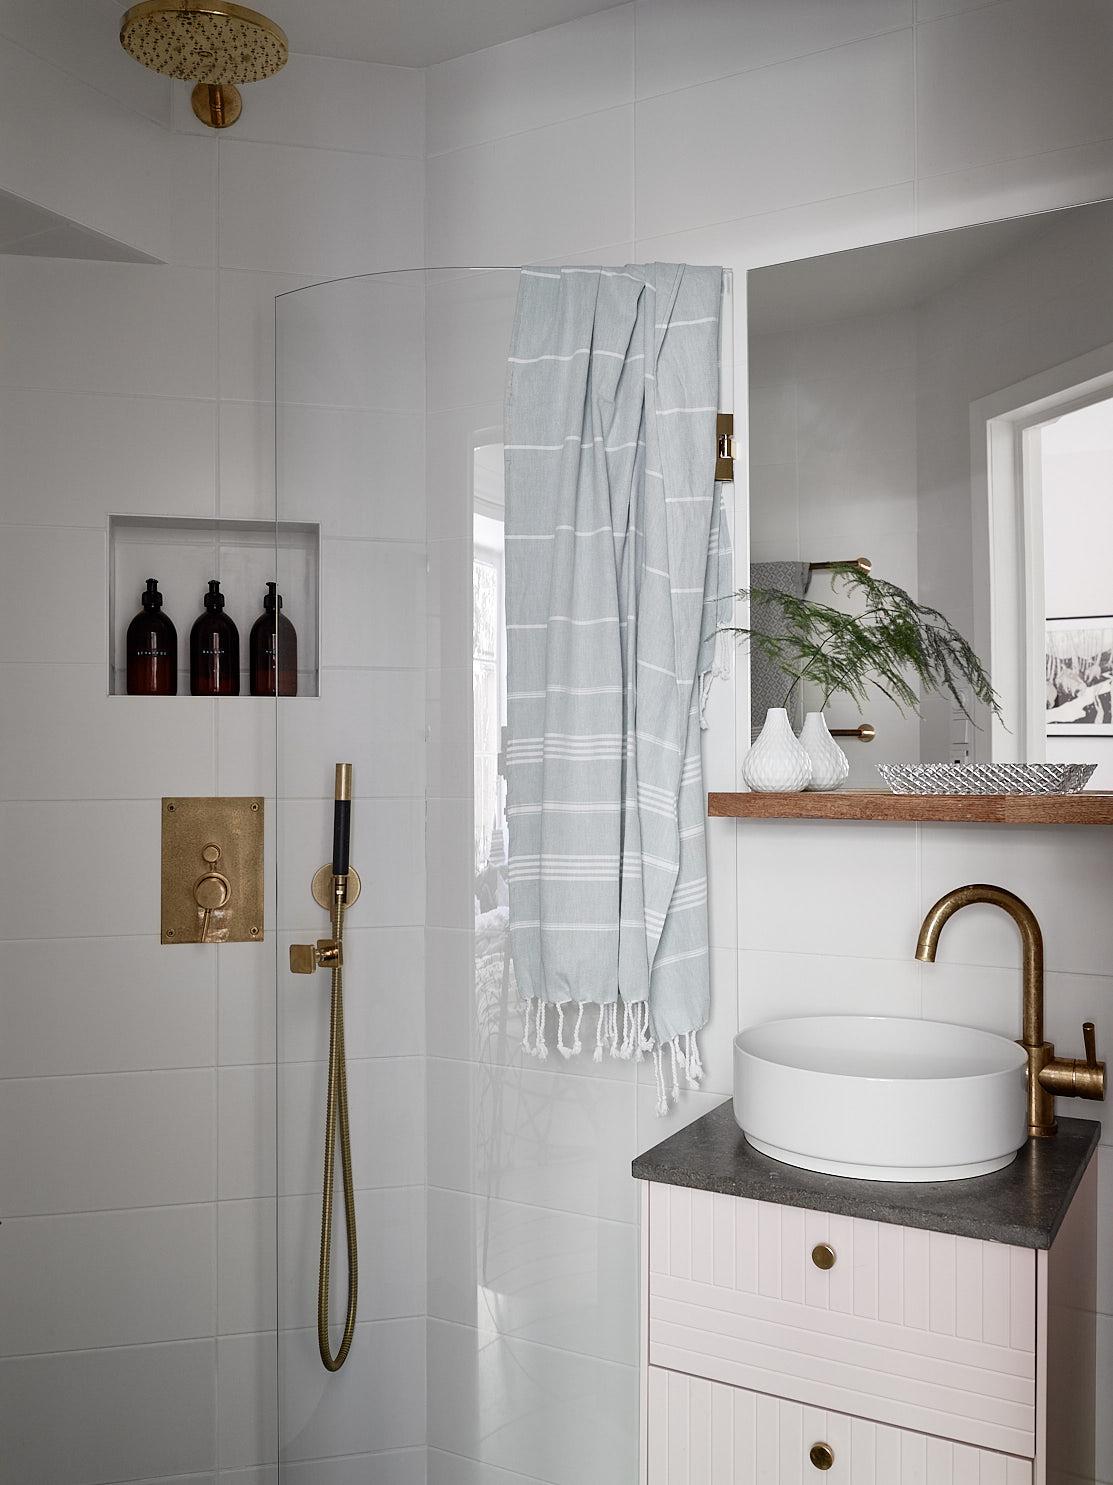 санузел раковина зеркало душ